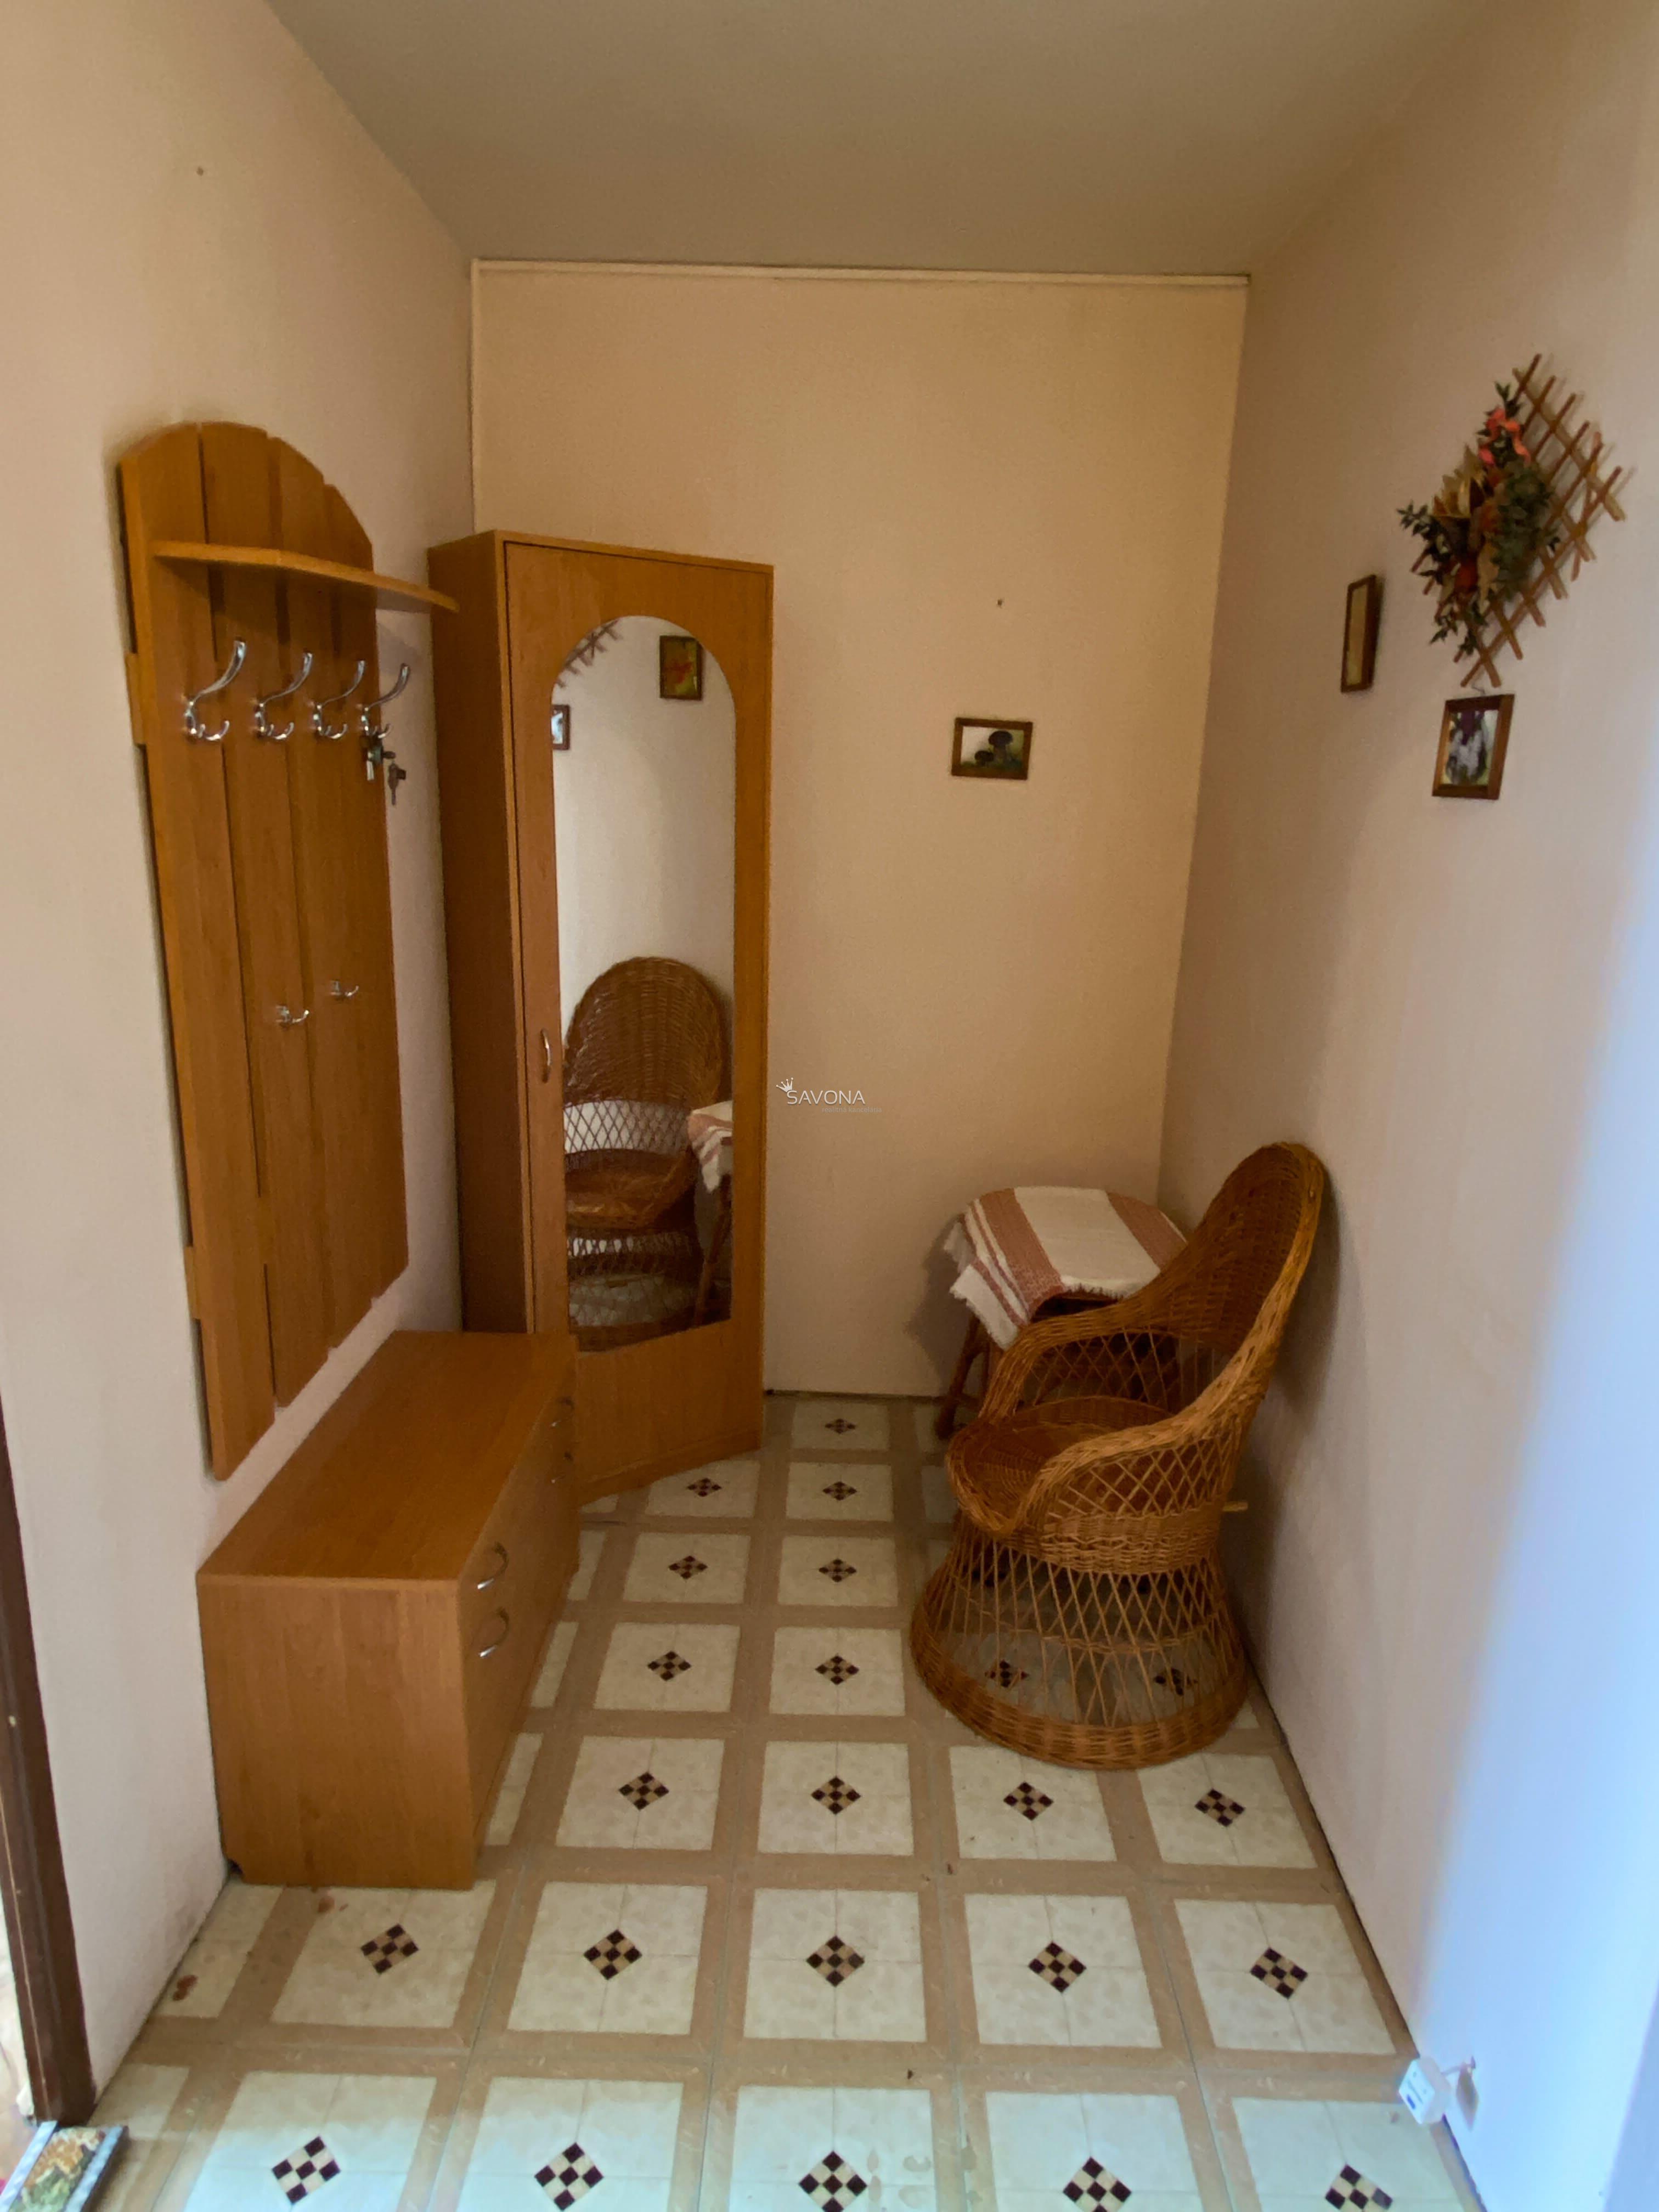 REZERVOVANÝ - 2 izbový byt s garážou, sídlisko Západ, POPRAD